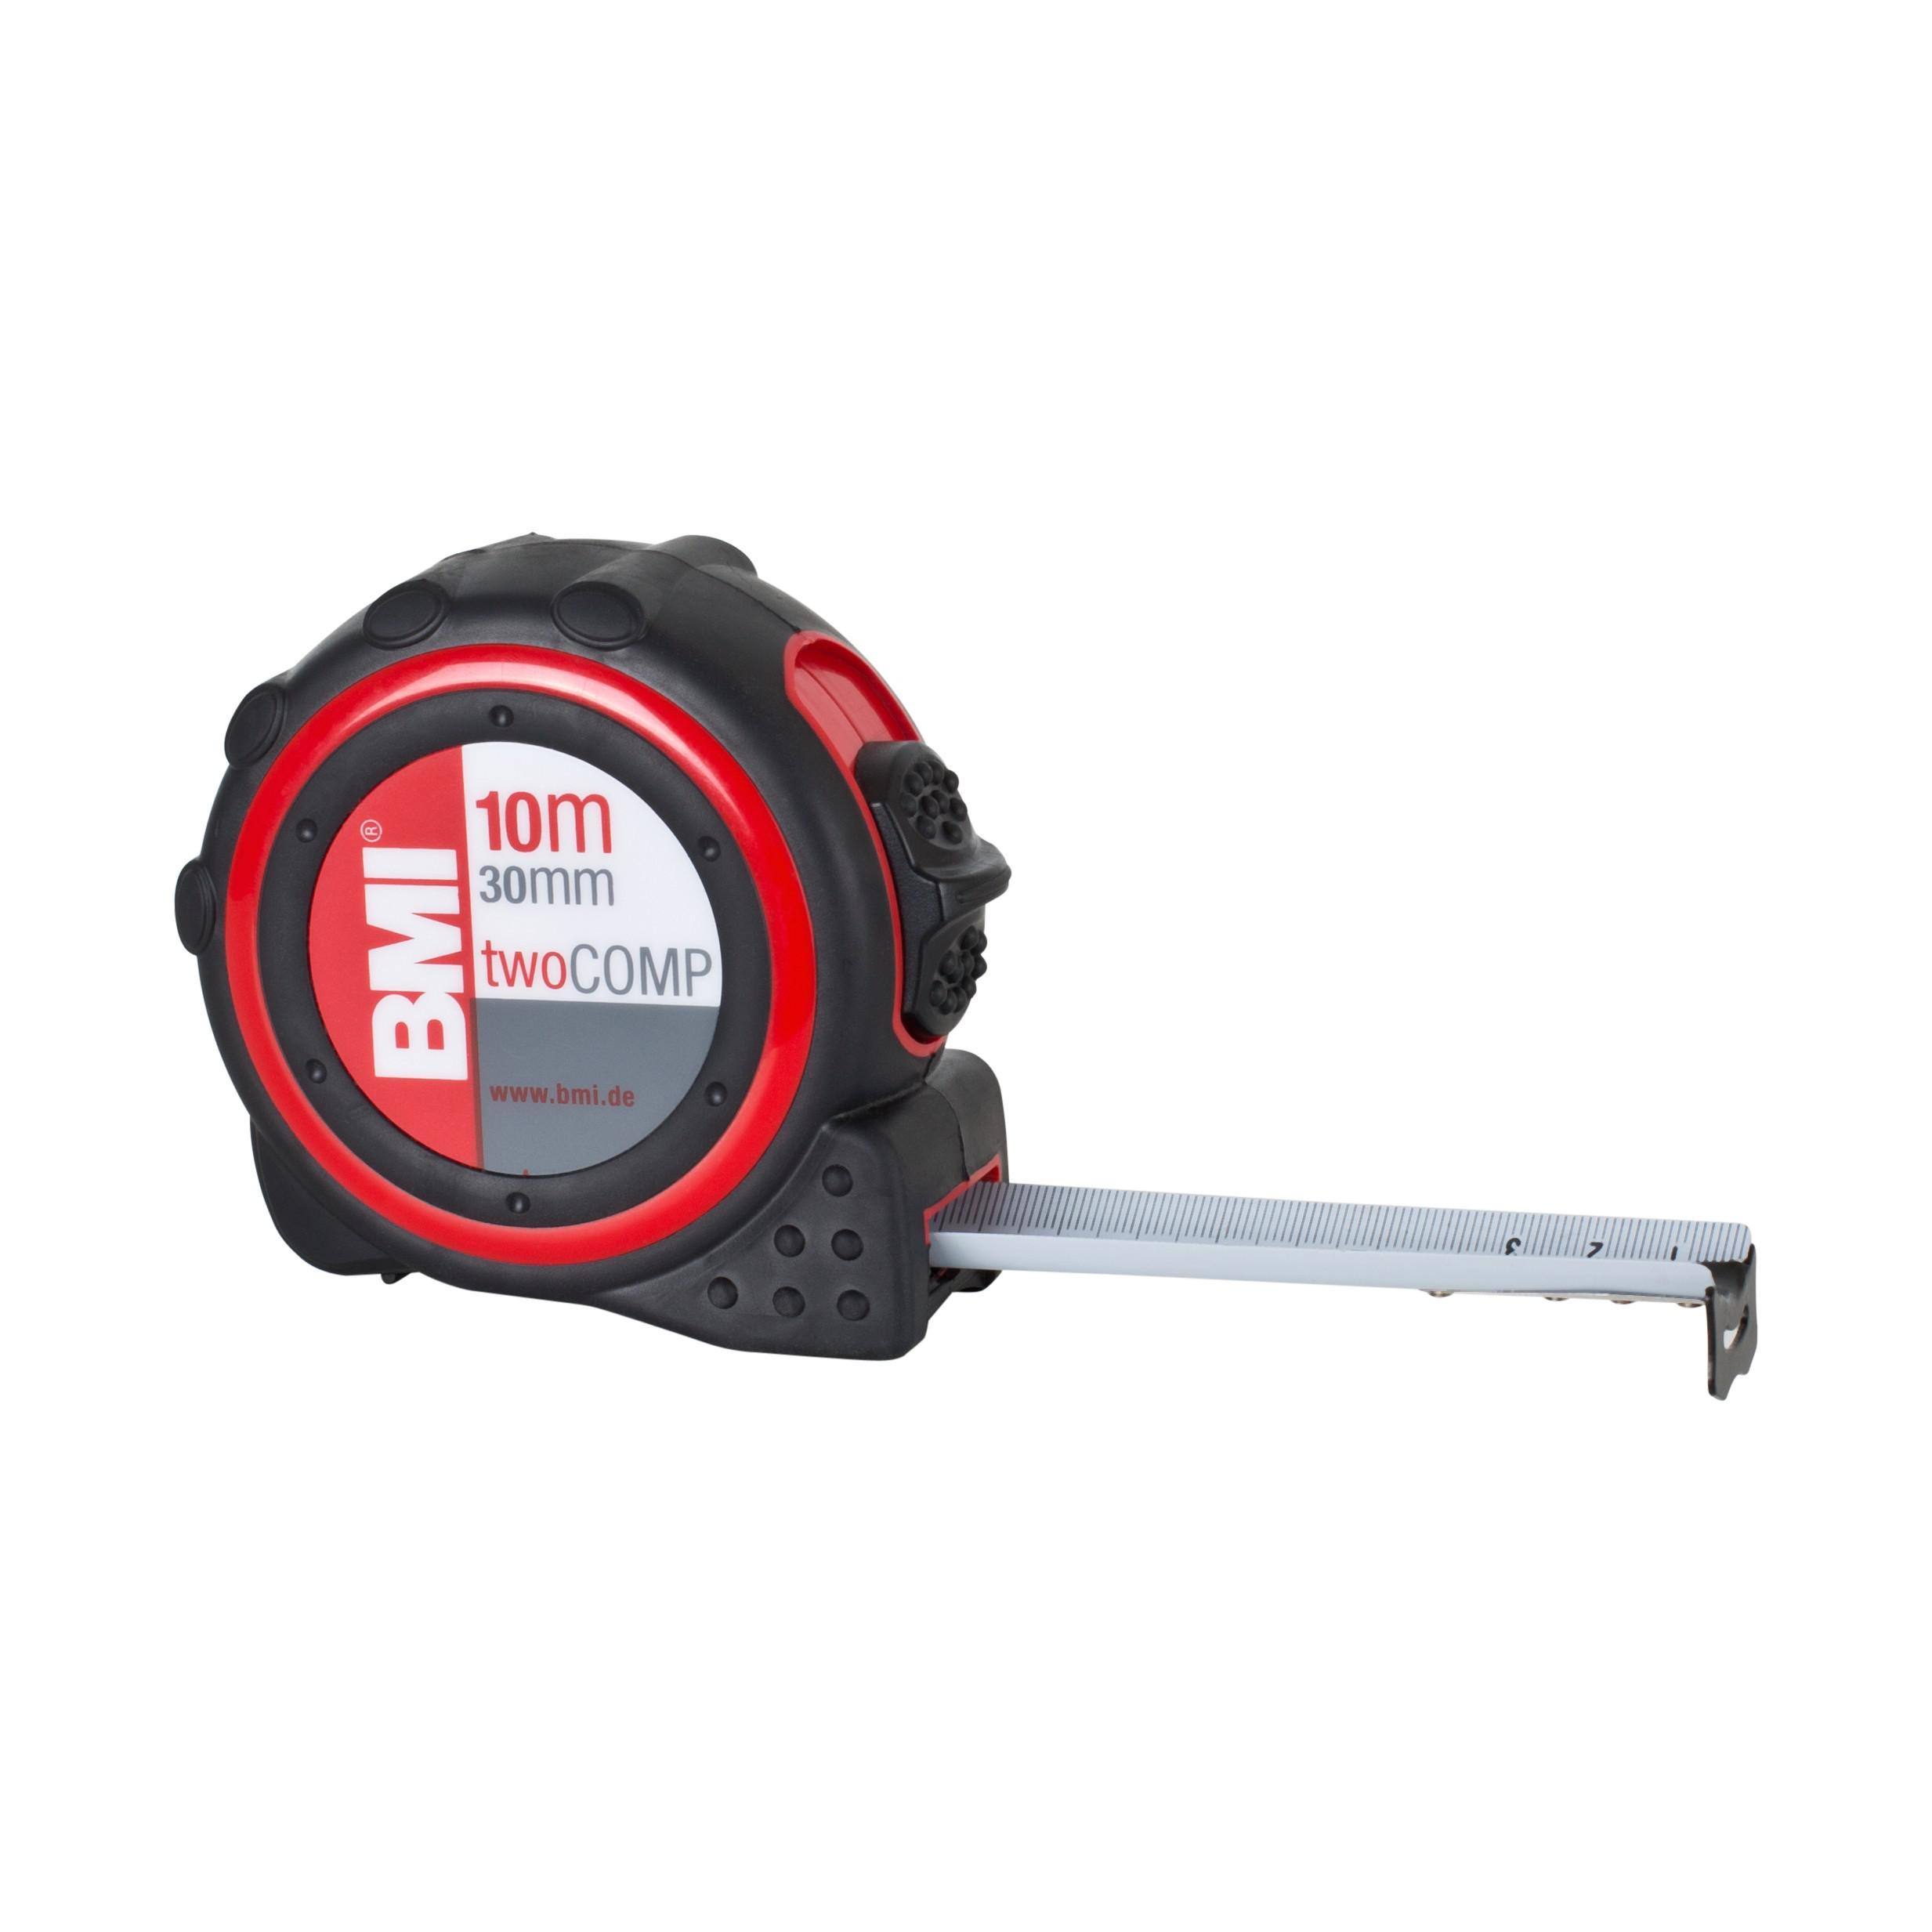 Рулетка Bmi Twocomp 10 m цены онлайн